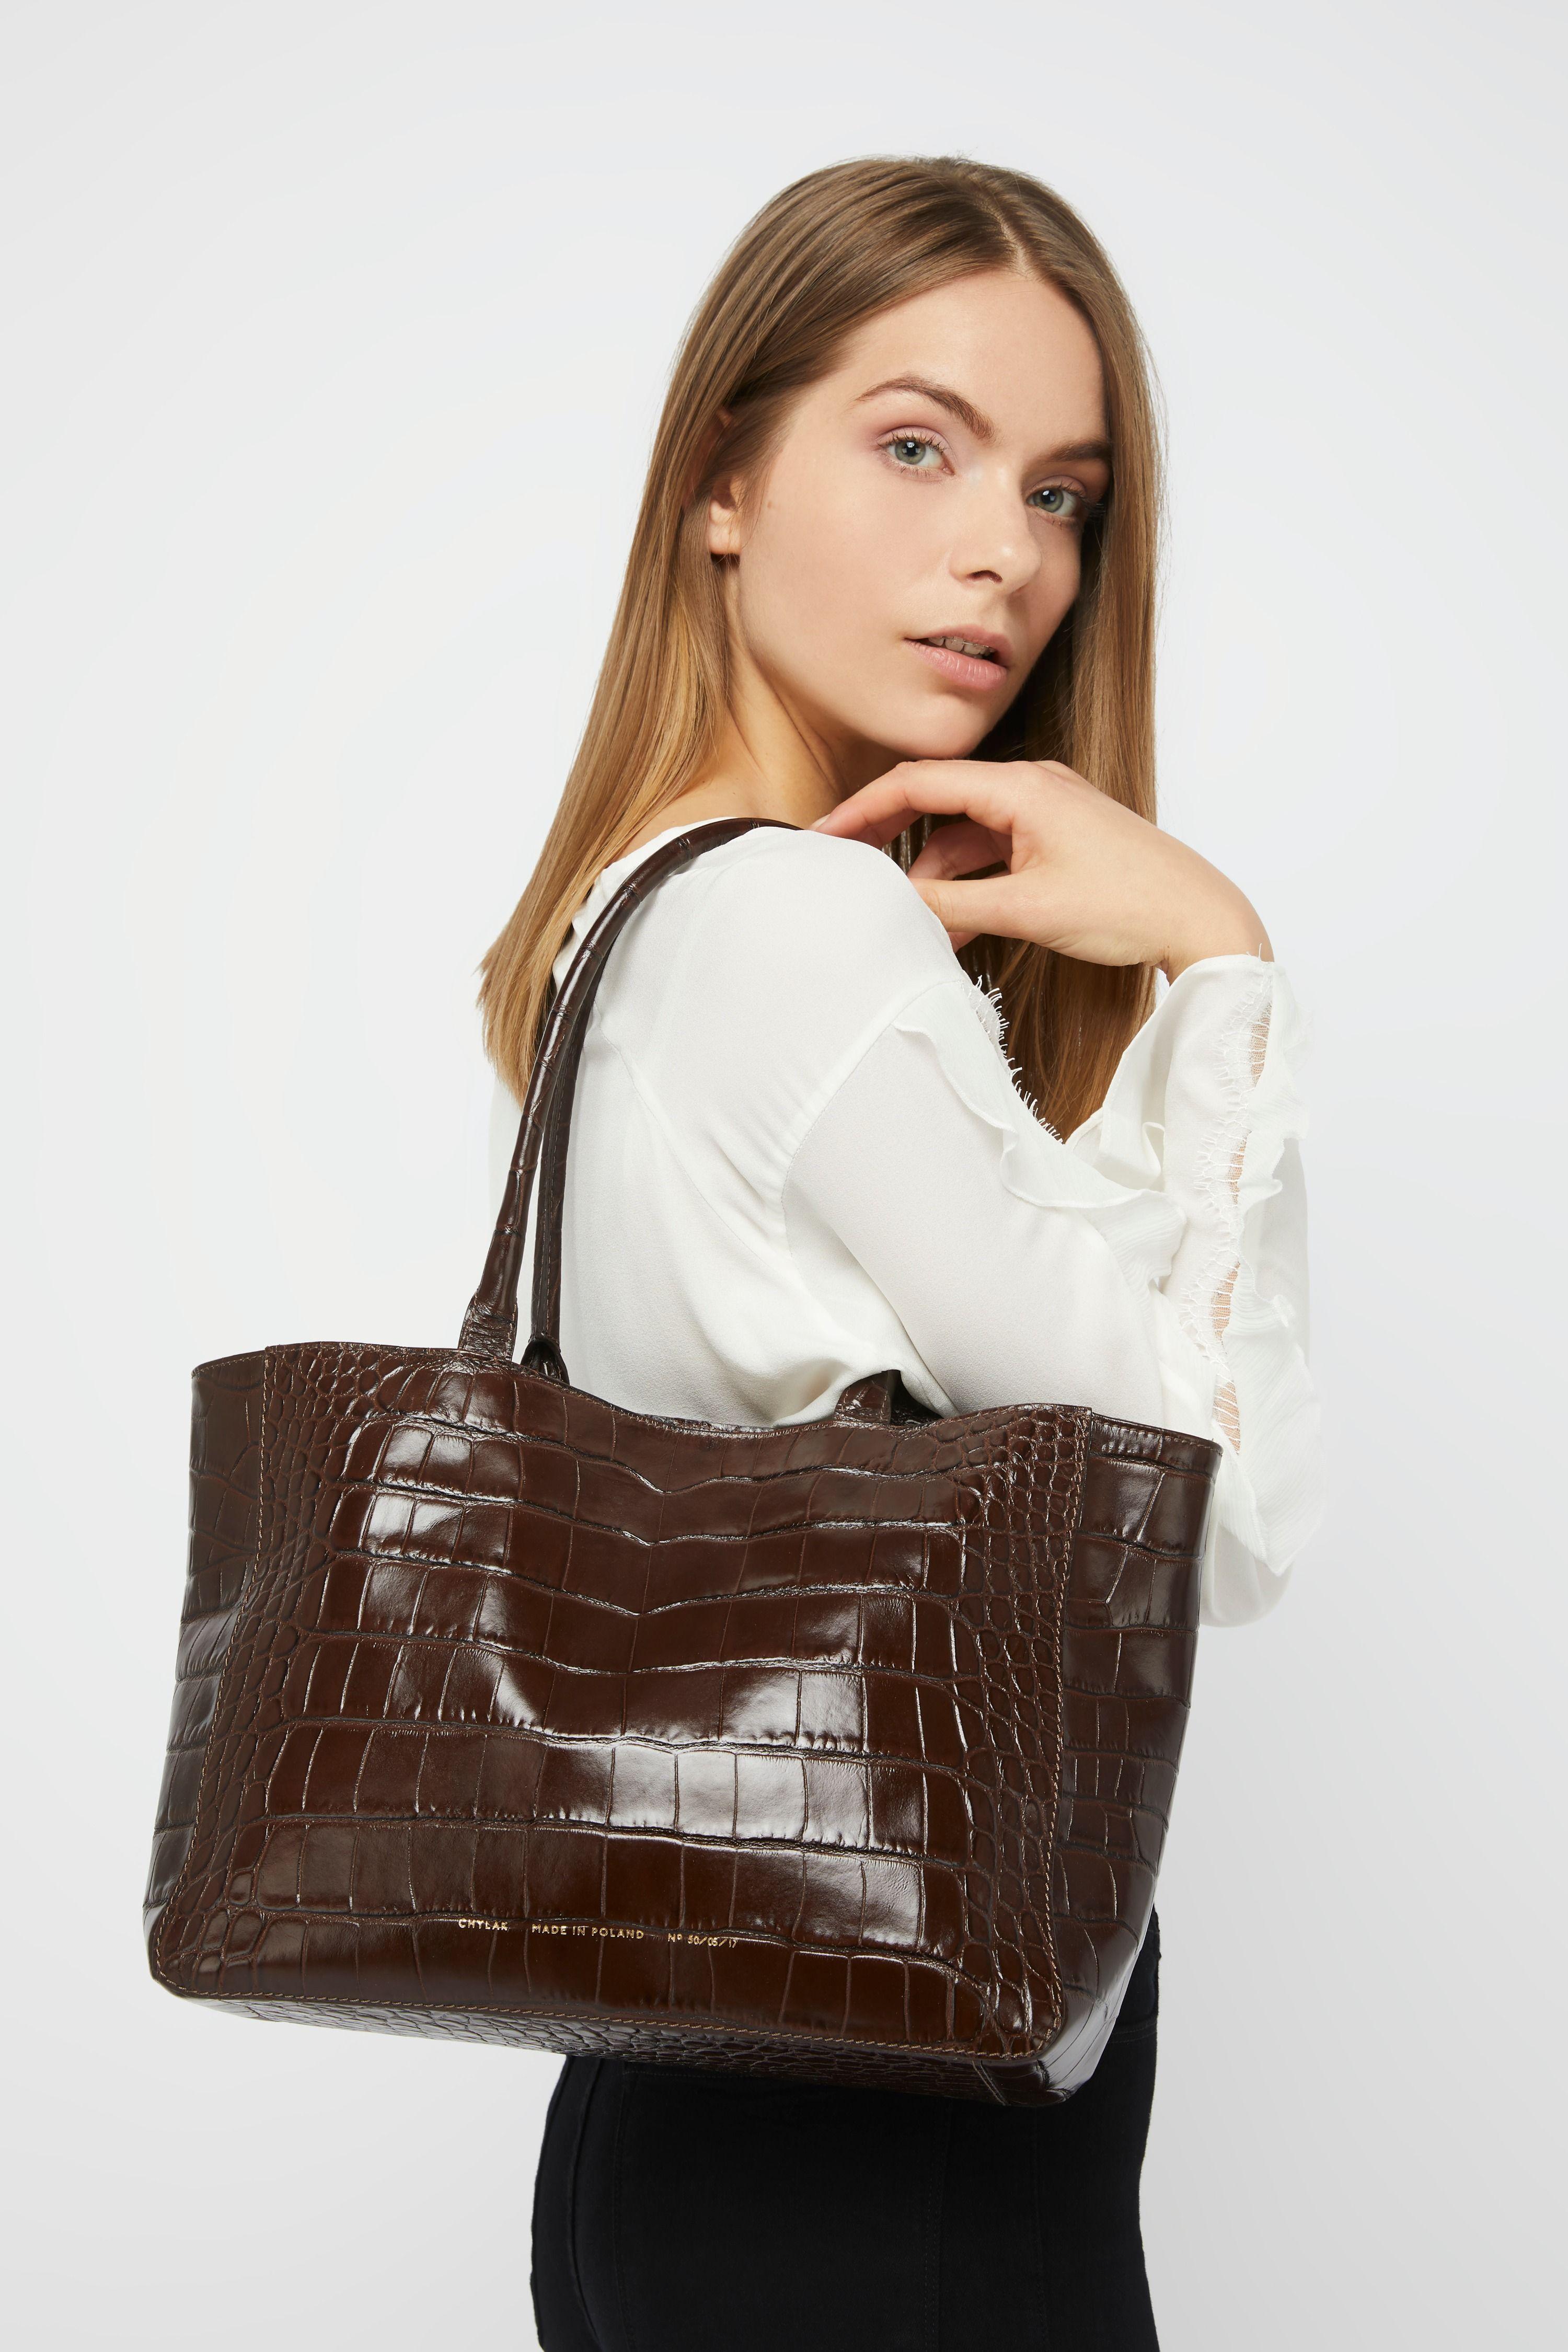 61131eb04 Chylak shoulder bag www.societestore.com   Chylak bags & accessories ...